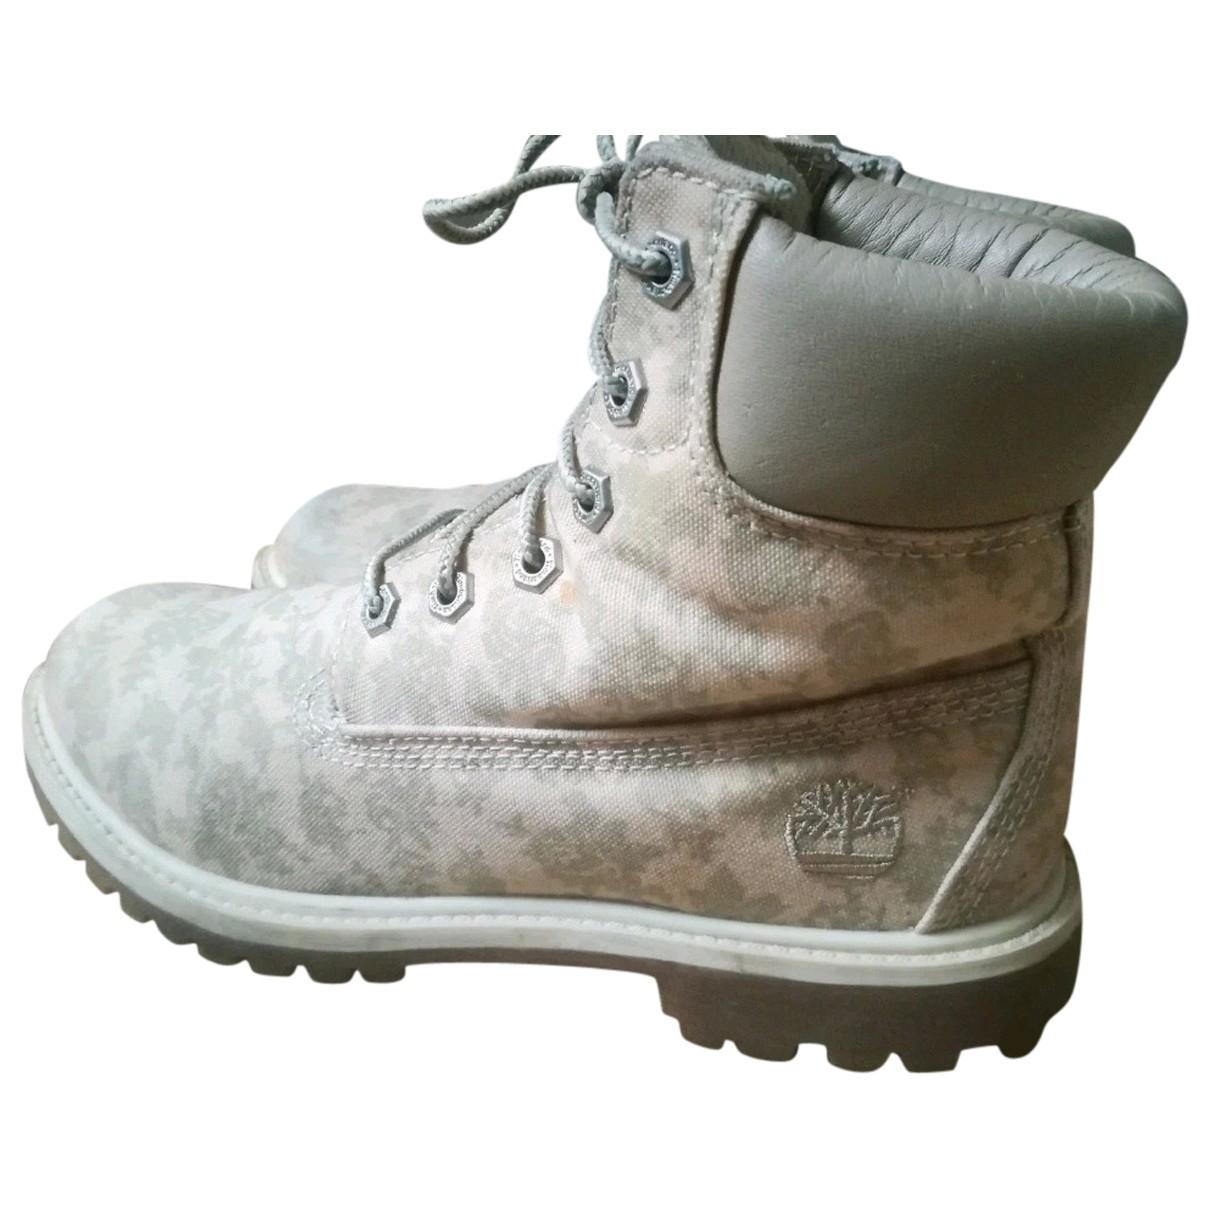 Timberland - Boots   pour femme en toile - beige